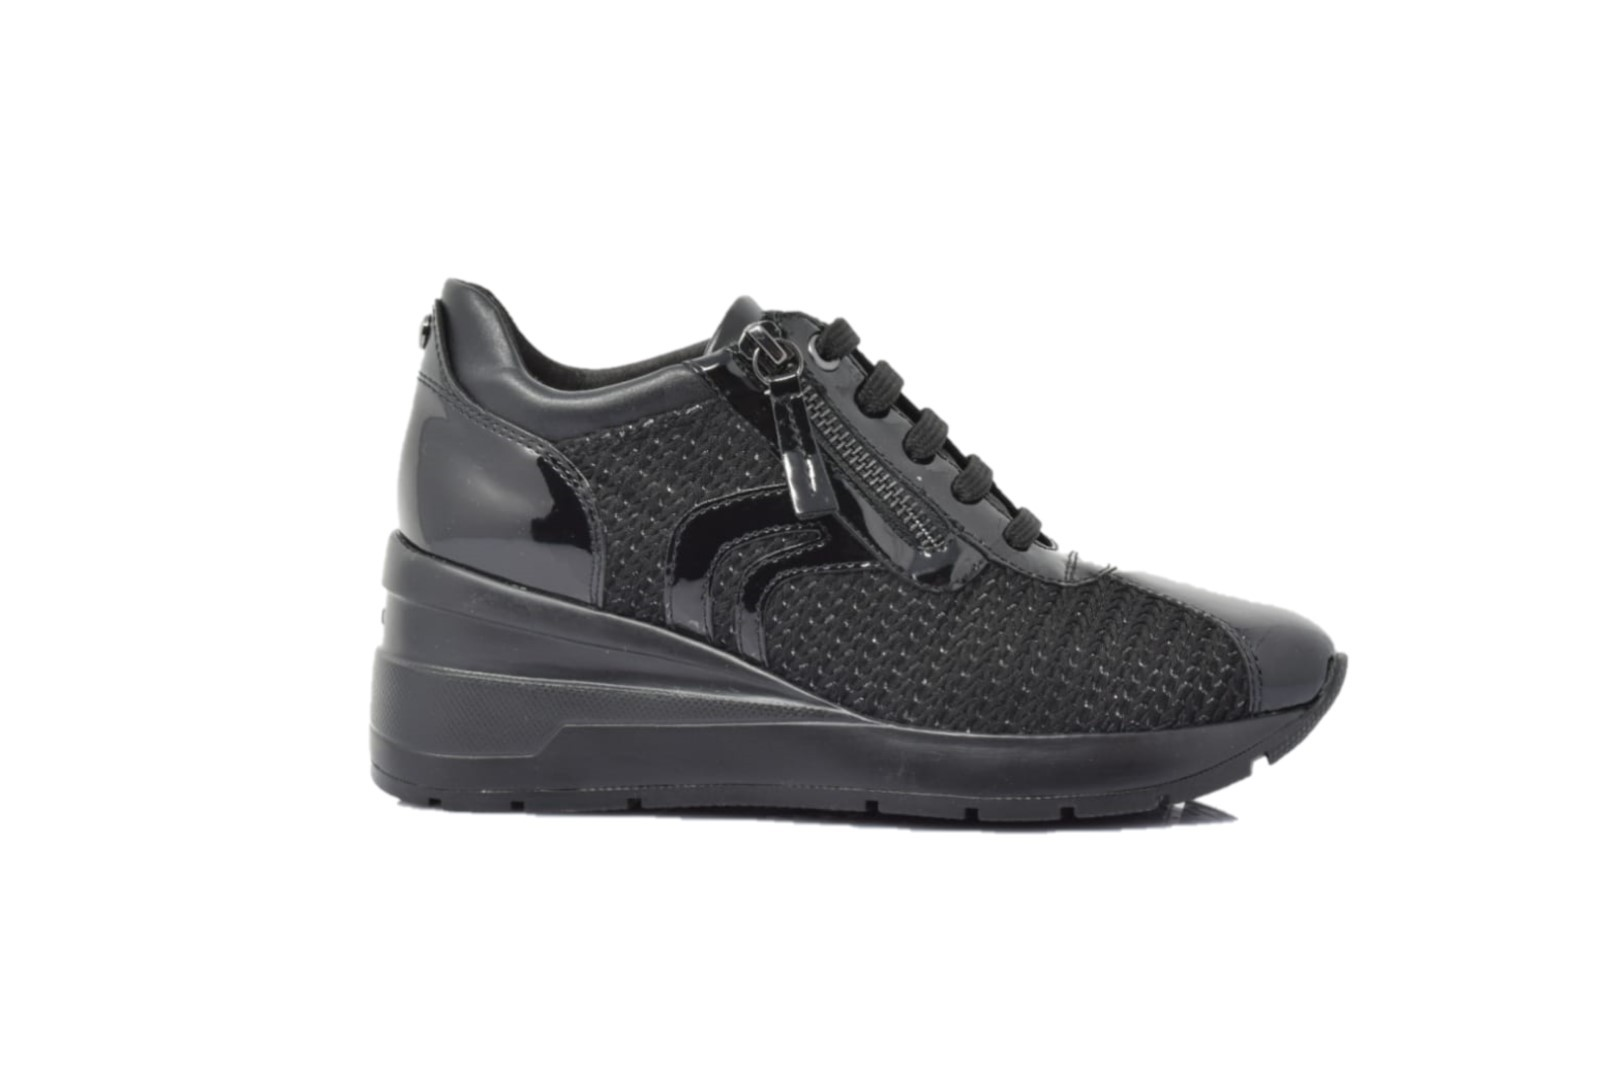 f839b6b3a5 GEOX ZOSMA Sneaker Black